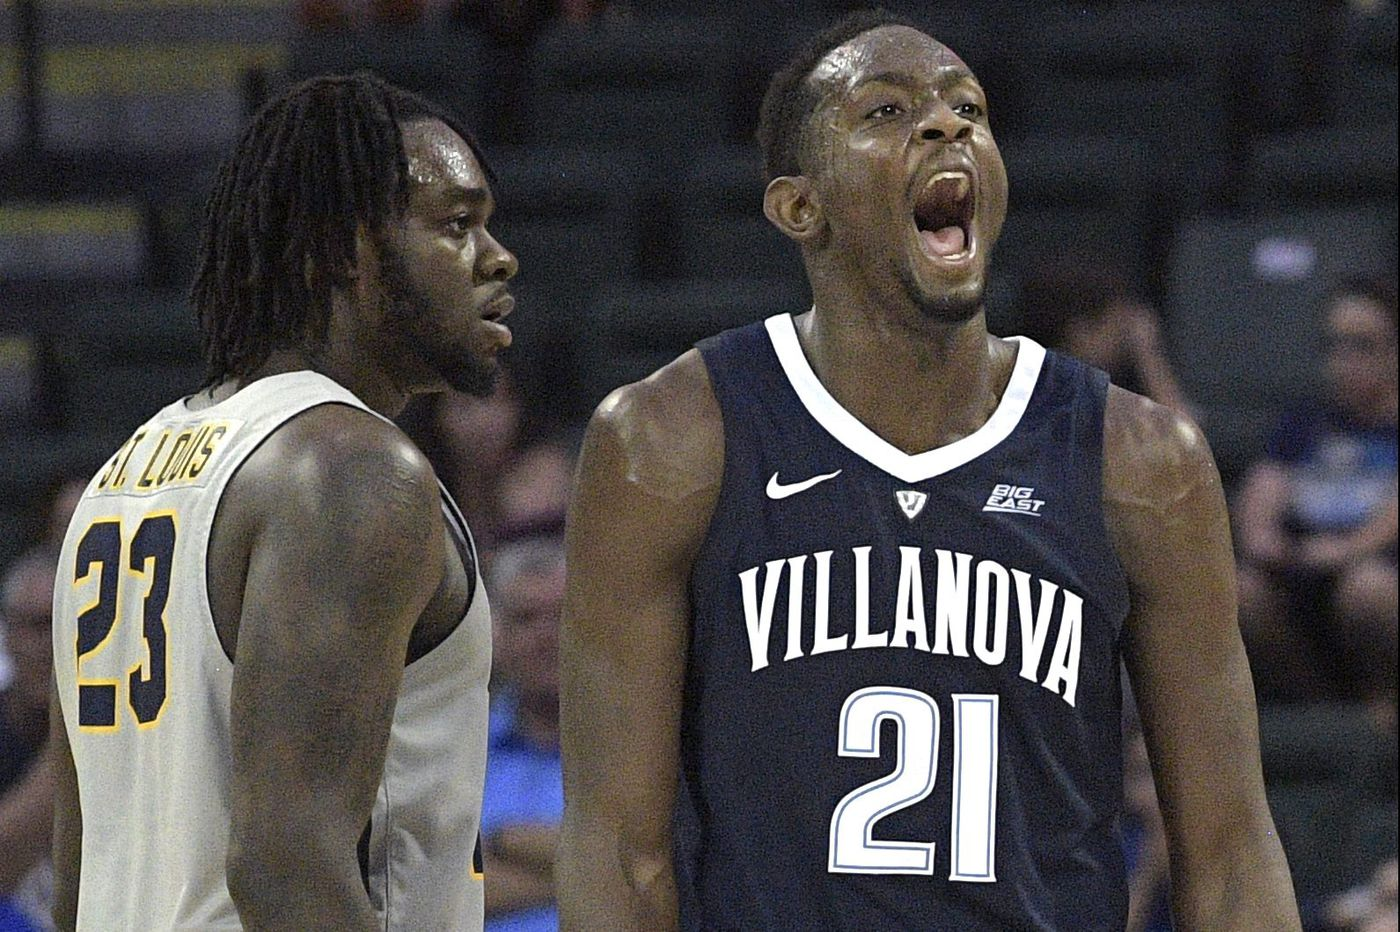 Villanova basketball recovers from losing streak, beating Canisius in AdvoCare Invitational